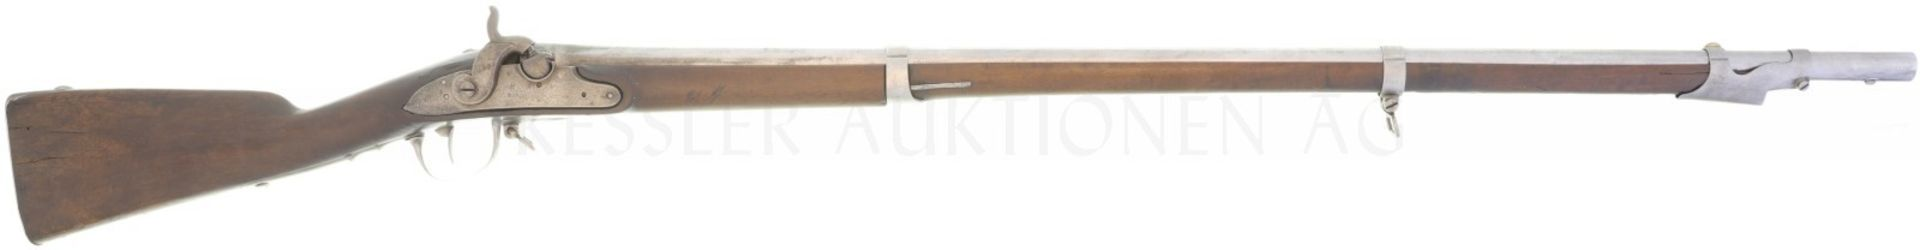 Perkussionsgewehr, Infanterie, St.Etienne, 1777/1840, Kal. 17.6mm